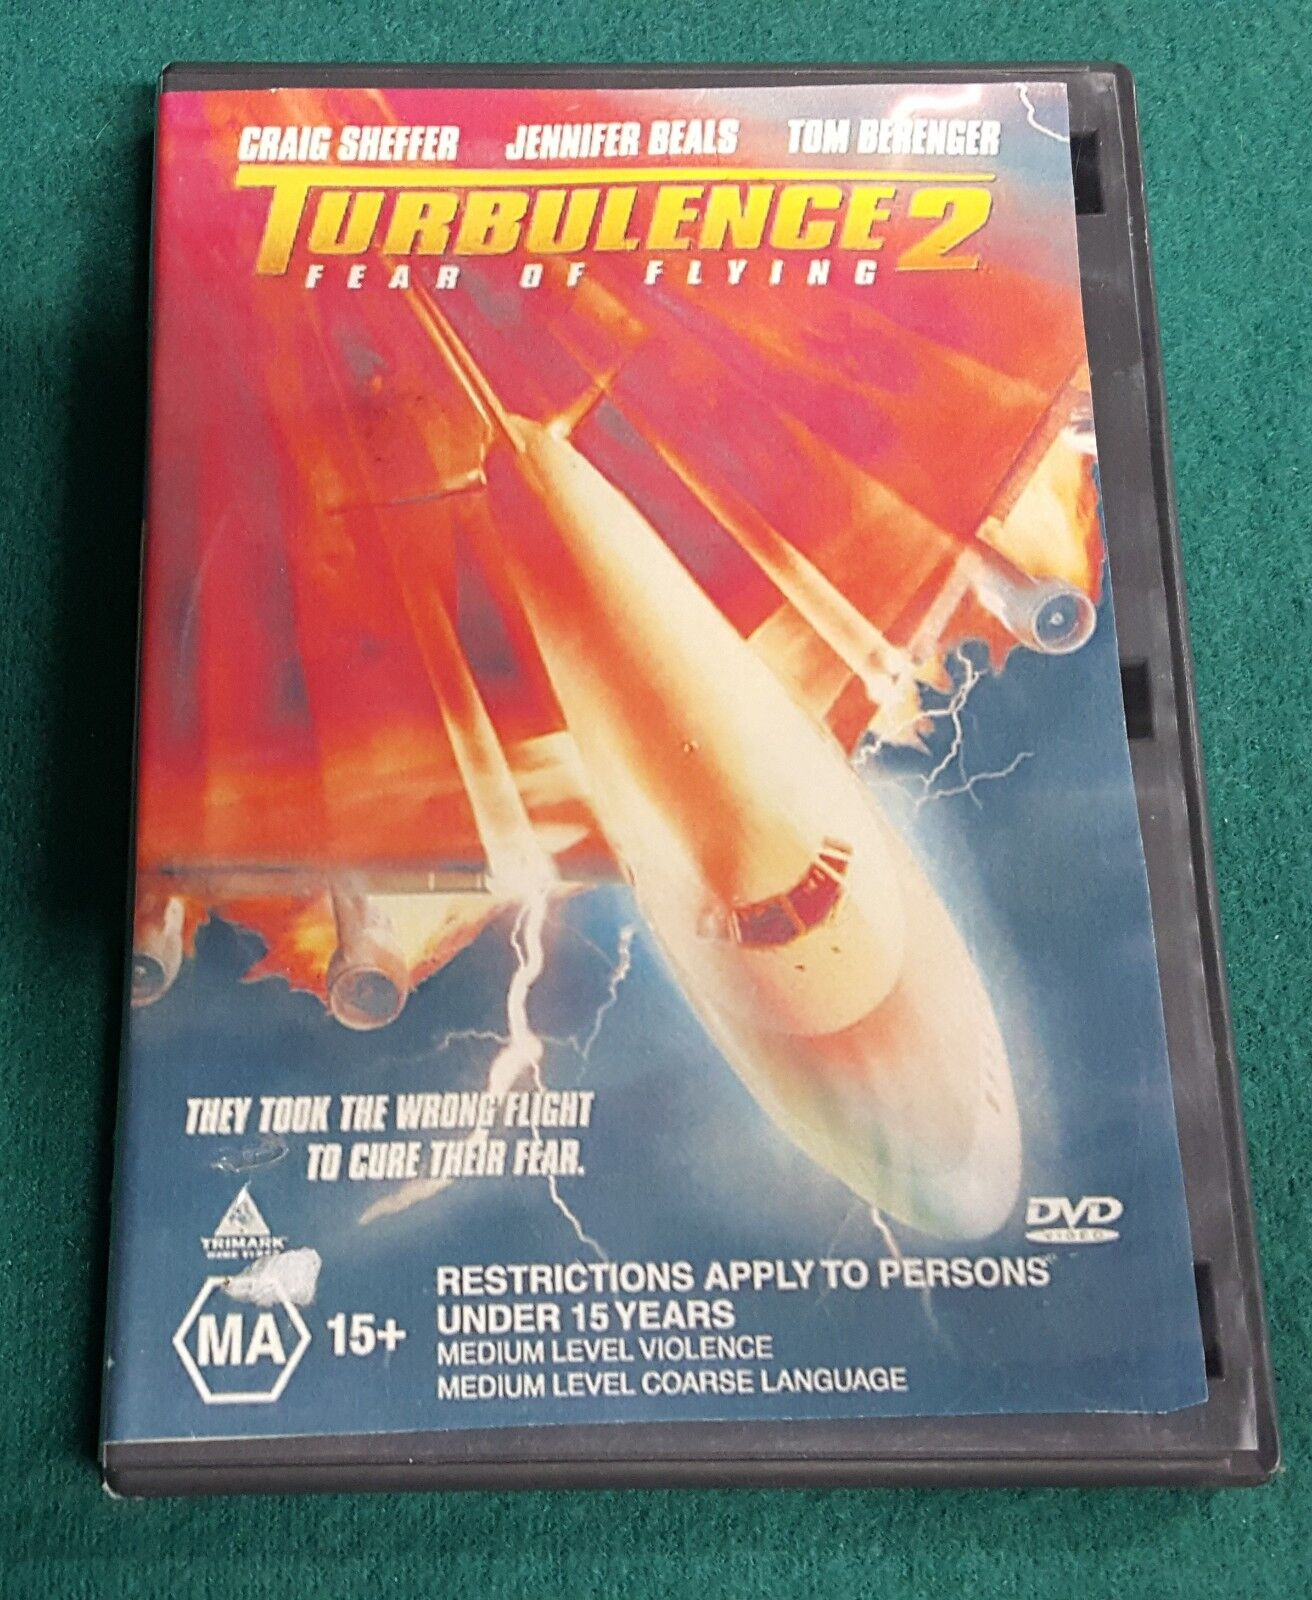 Turbulence 2: Fear of Flying (DVD, 2000) 1